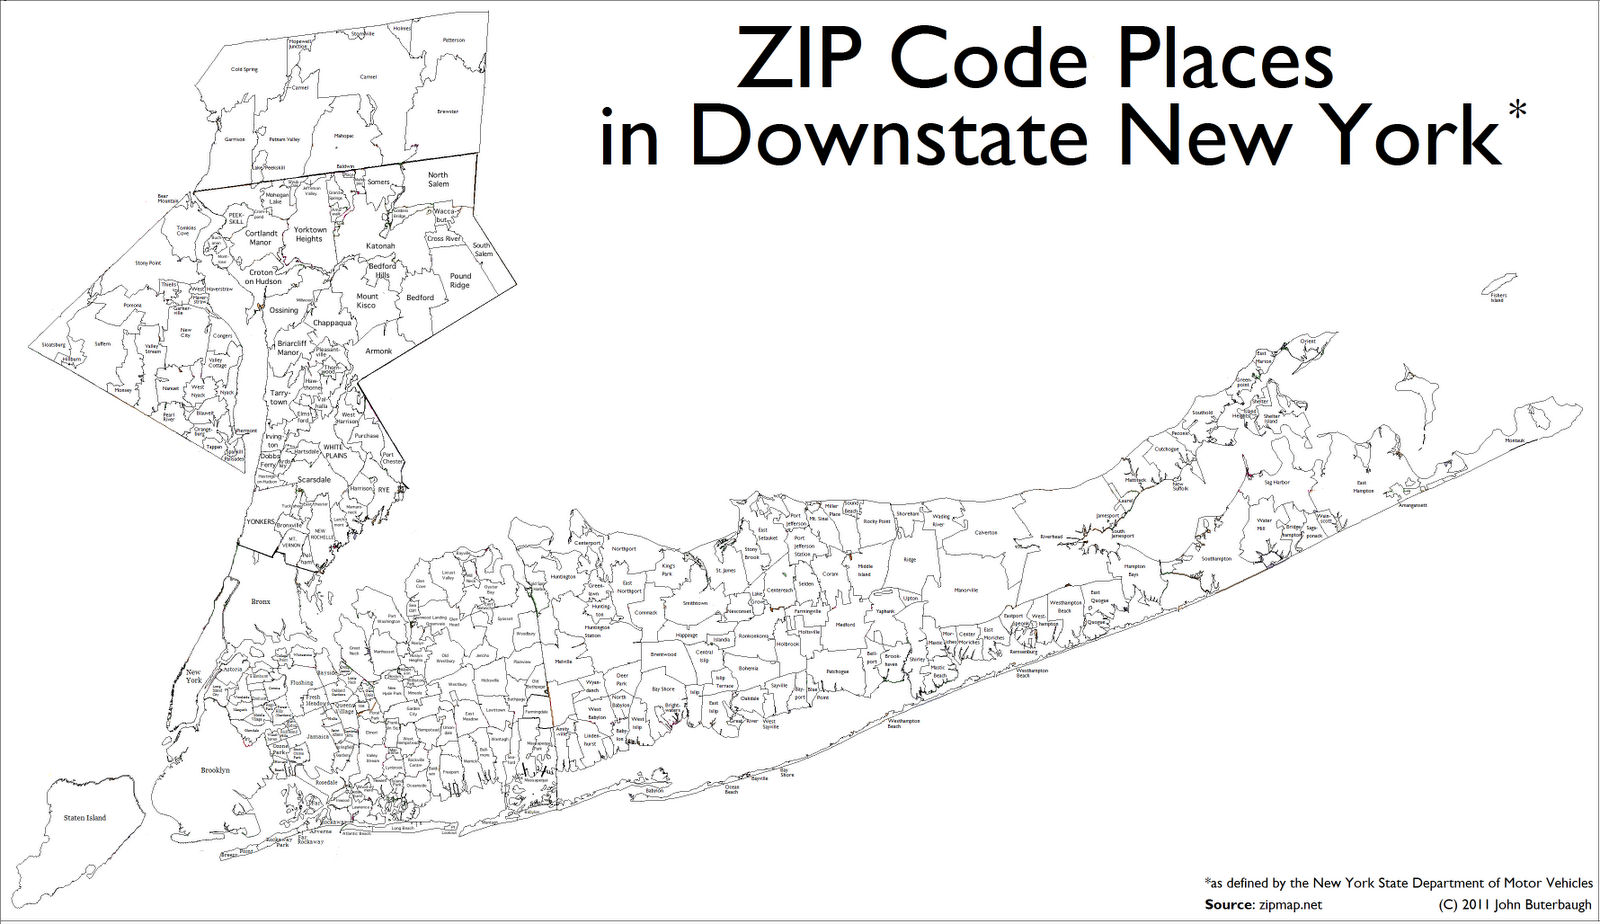 The Buterblog: 39. I'd Map That on hempstead zip code map, buffalo zip code map, poughkeepsie zip code map, schenectady zip code map, westchester zip code map, new york counties by zip, astoria zip code map, midtown manhattan zip code map, capital region new york state map, kings zip code map, ward pound ridge reservation trail map, new york state area code map, bronx ny zip code map, montgomery zip code map, rochester zip code map, saratoga springs zip code map, new york zip code list, new york ny counties map, orange county new york map, upstate ny zip code map,